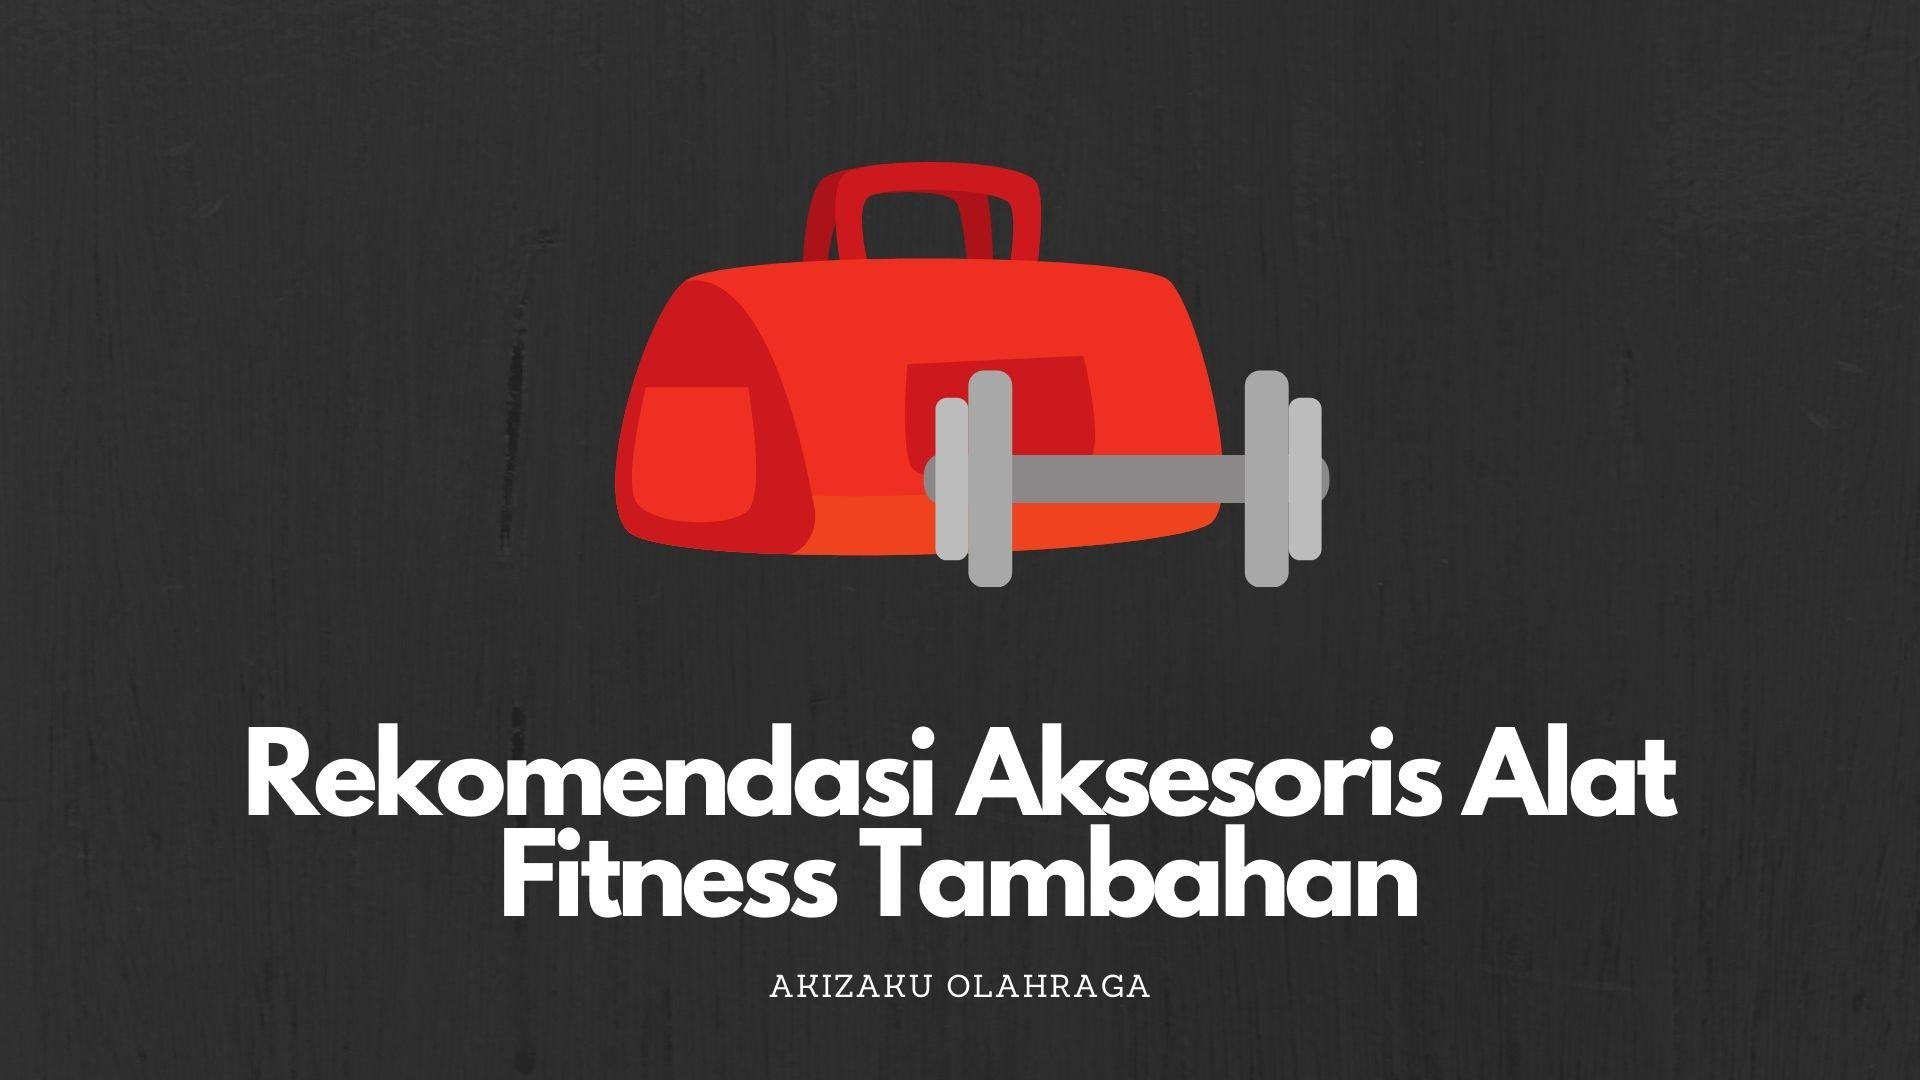 [Image: Rekomendasi-Aksesoris-Alat-Fitness-Tambahan.jpg]